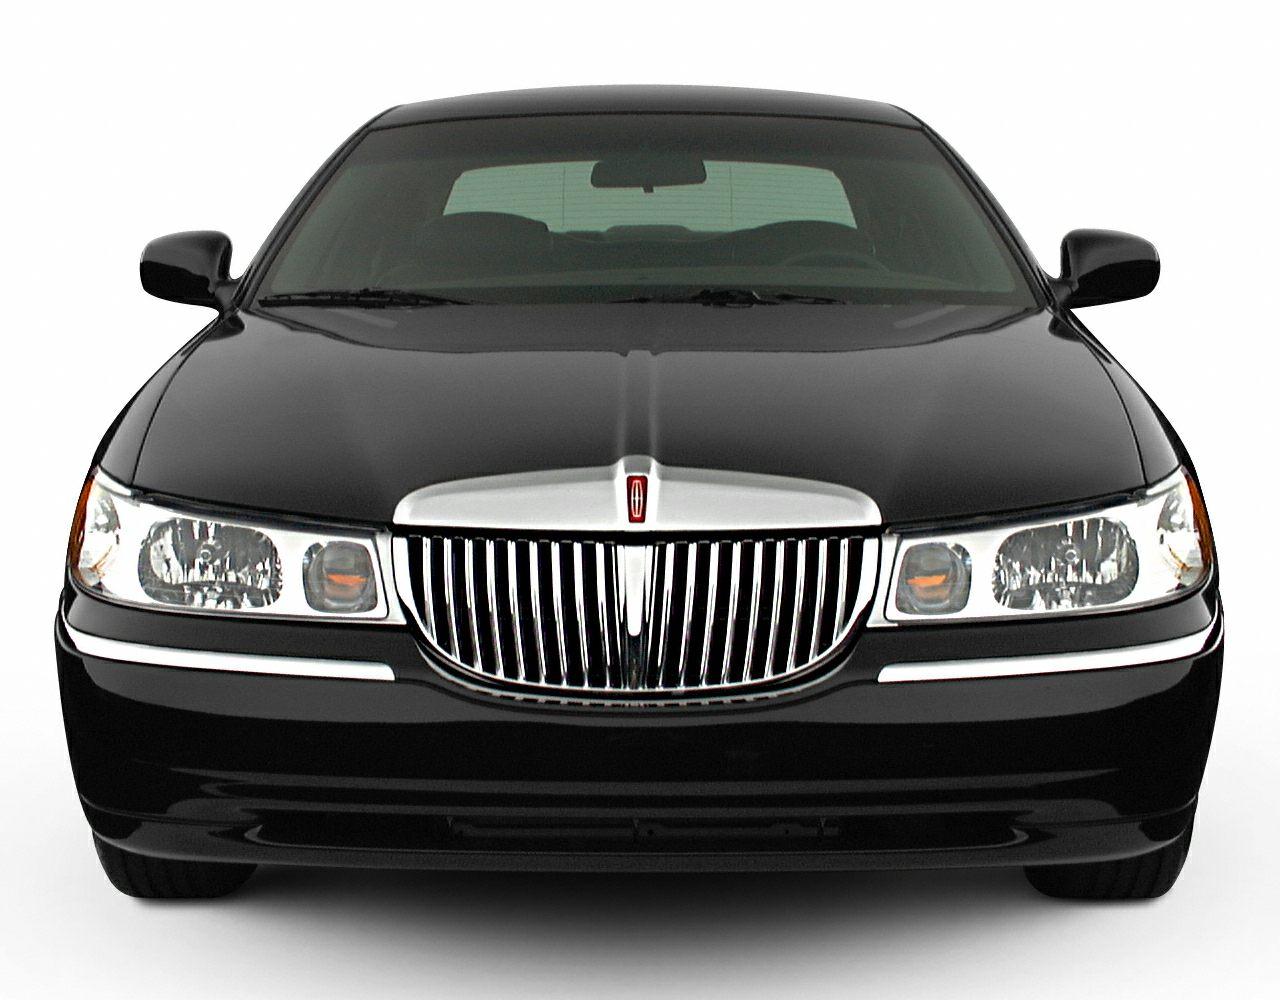 2000 Lincoln Town Car Exterior Photo